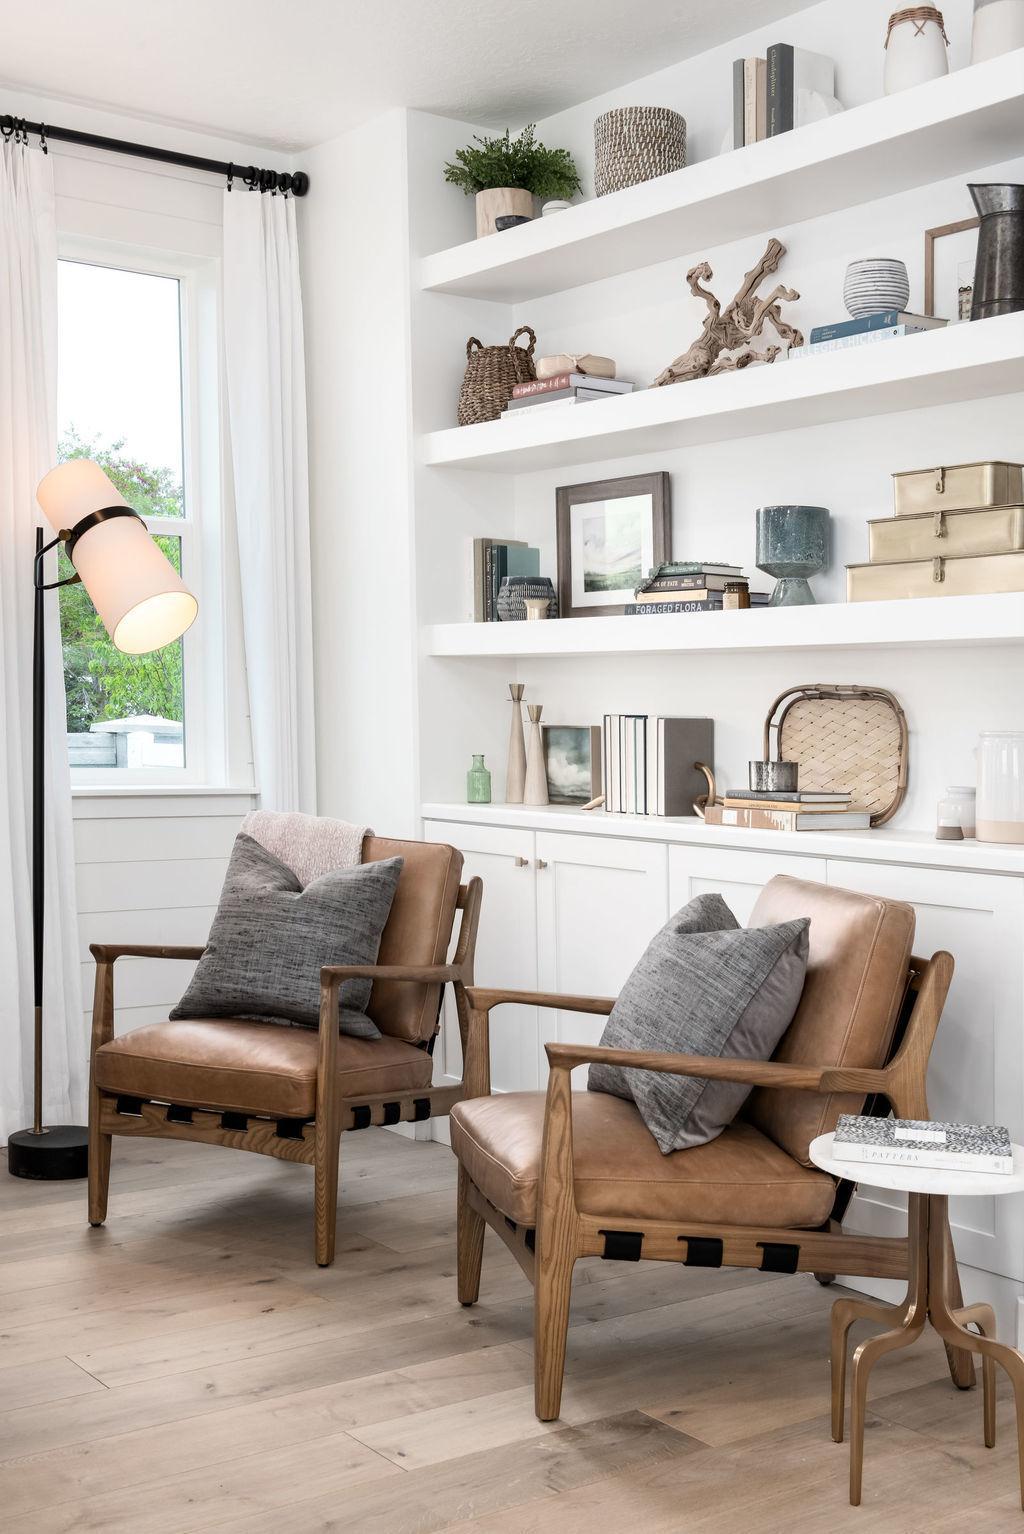 Living Area featured in the Matisse By Garbett Homes in Salt Lake City-Ogden, UT